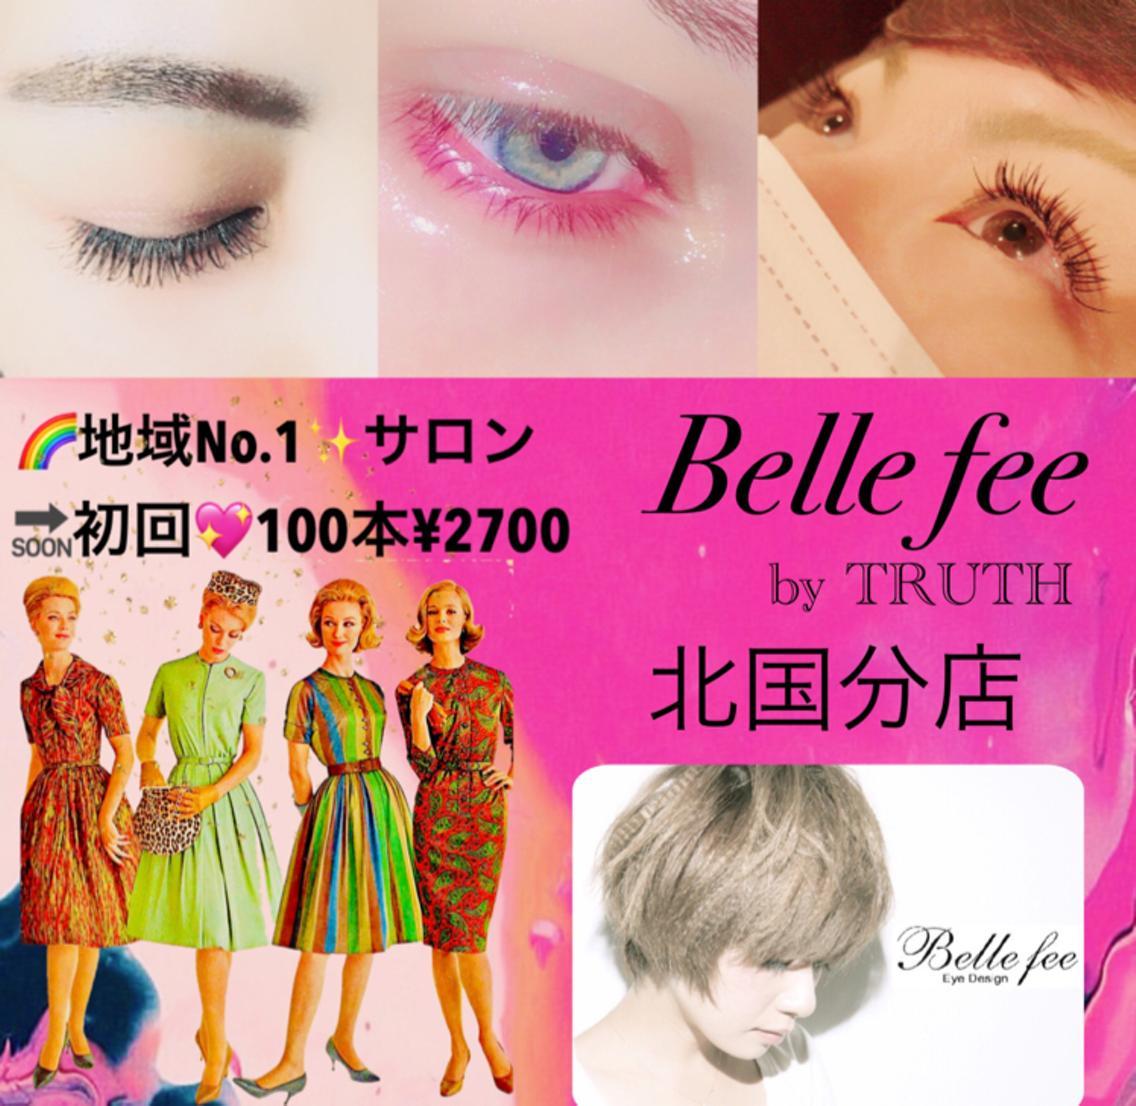 BellFeeby TRUTH北国分店所属・🦋マルヤマミナキ🦋の掲載